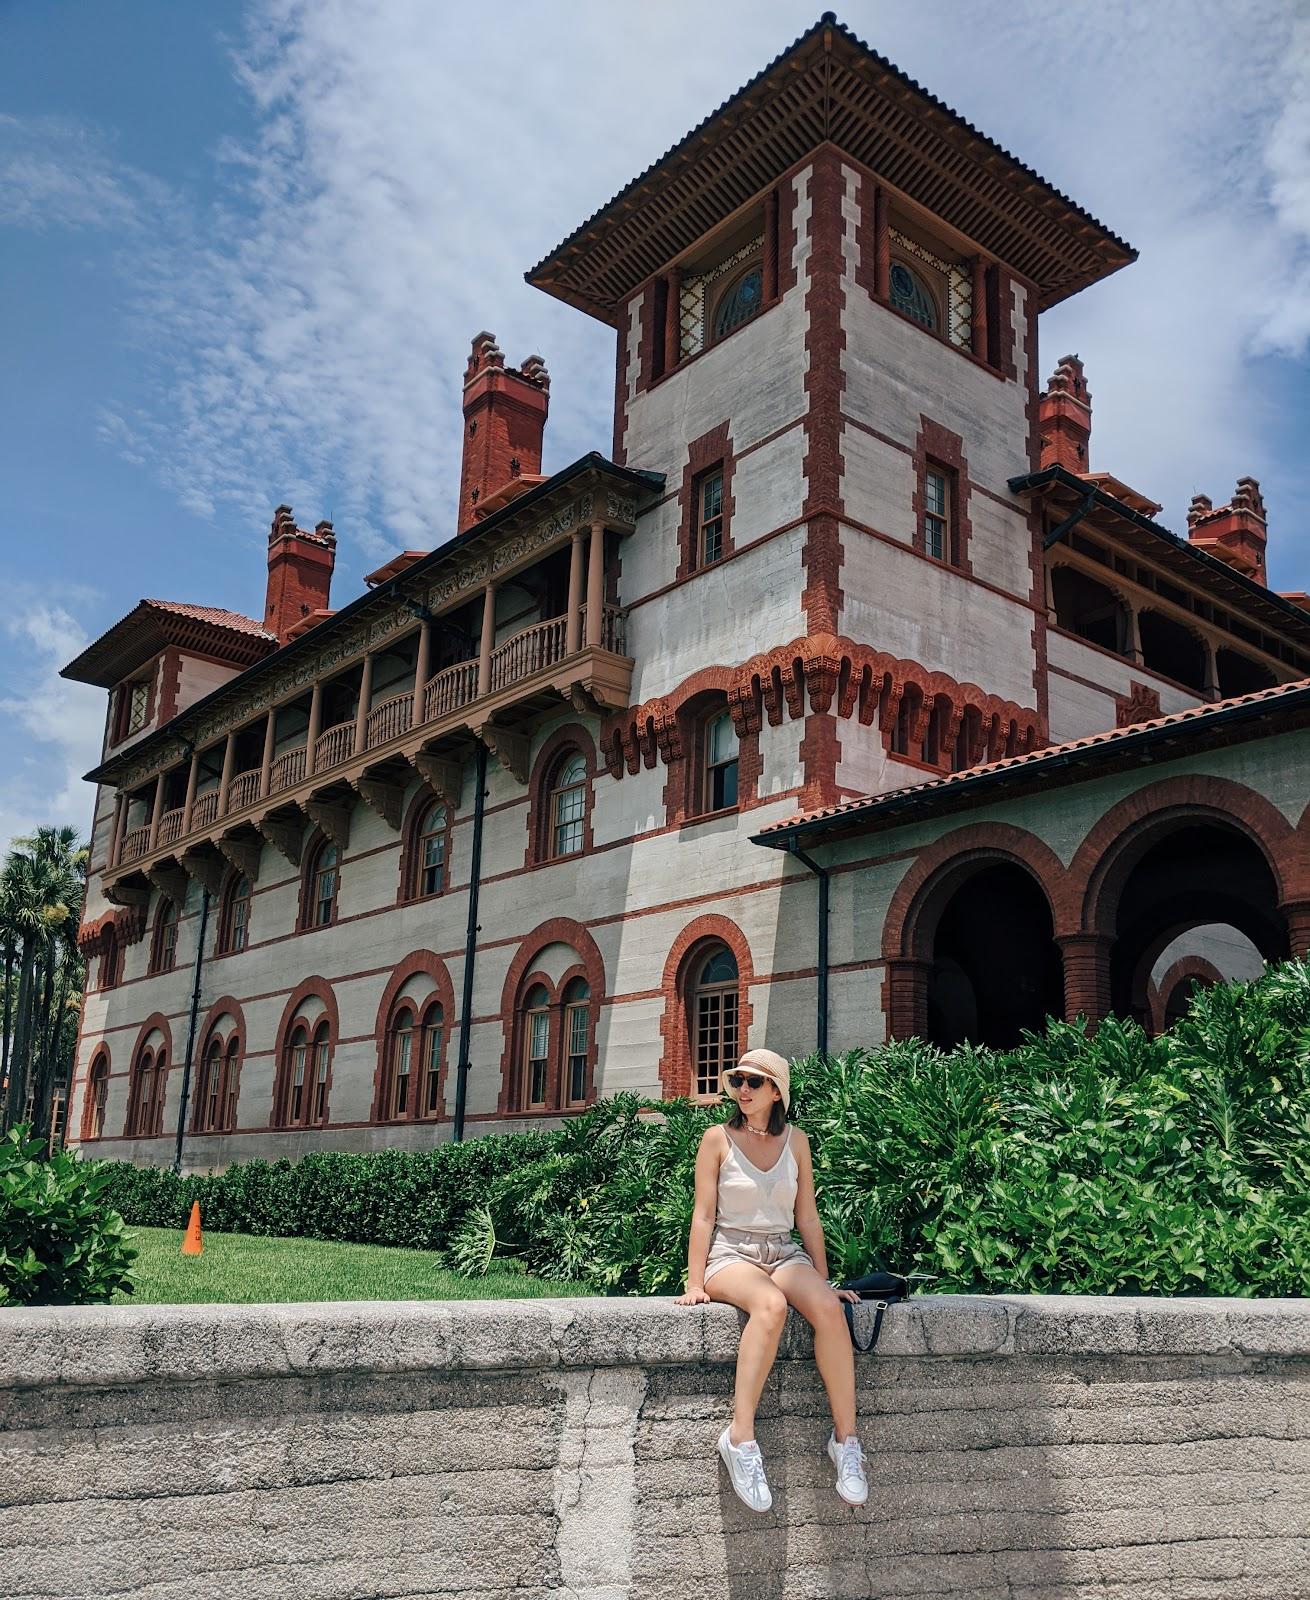 TRAVEL IN FLORIDA SAINT AUGUSTINE SPANISH INSPIRATION